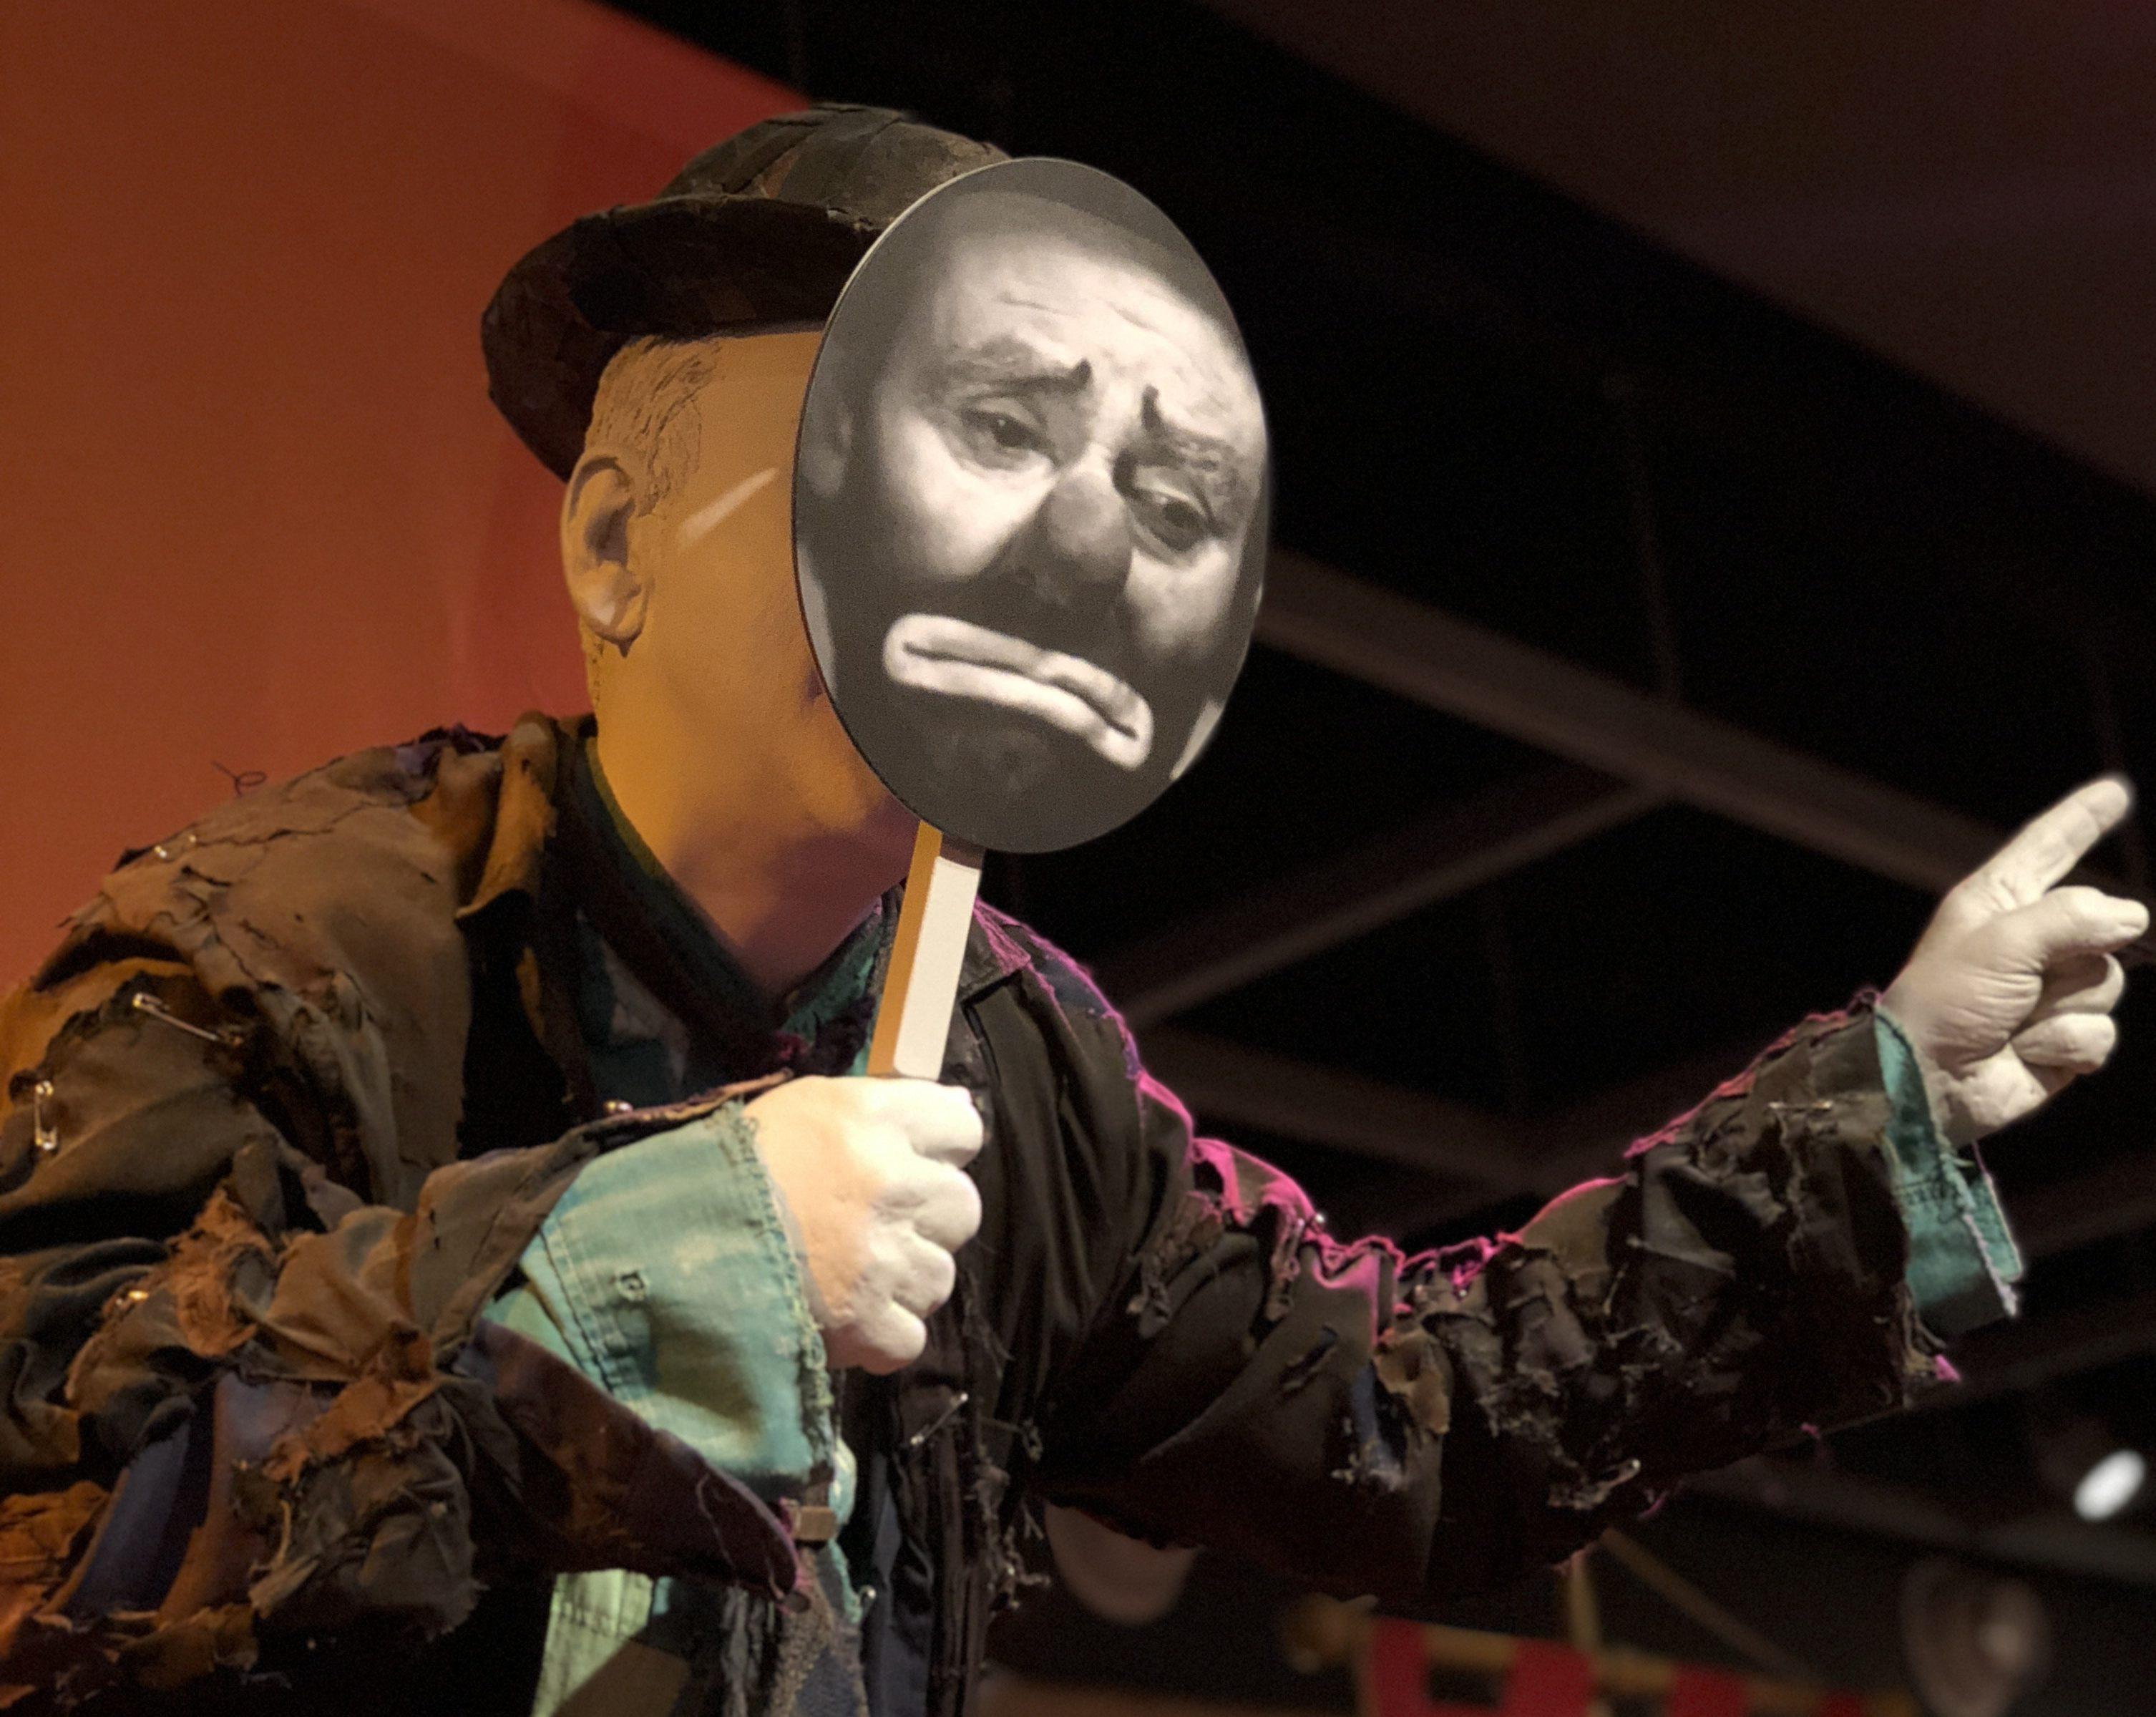 From Emmett Kelly to Pee-Wee Herman to Steve-O: Sarasota's clown history